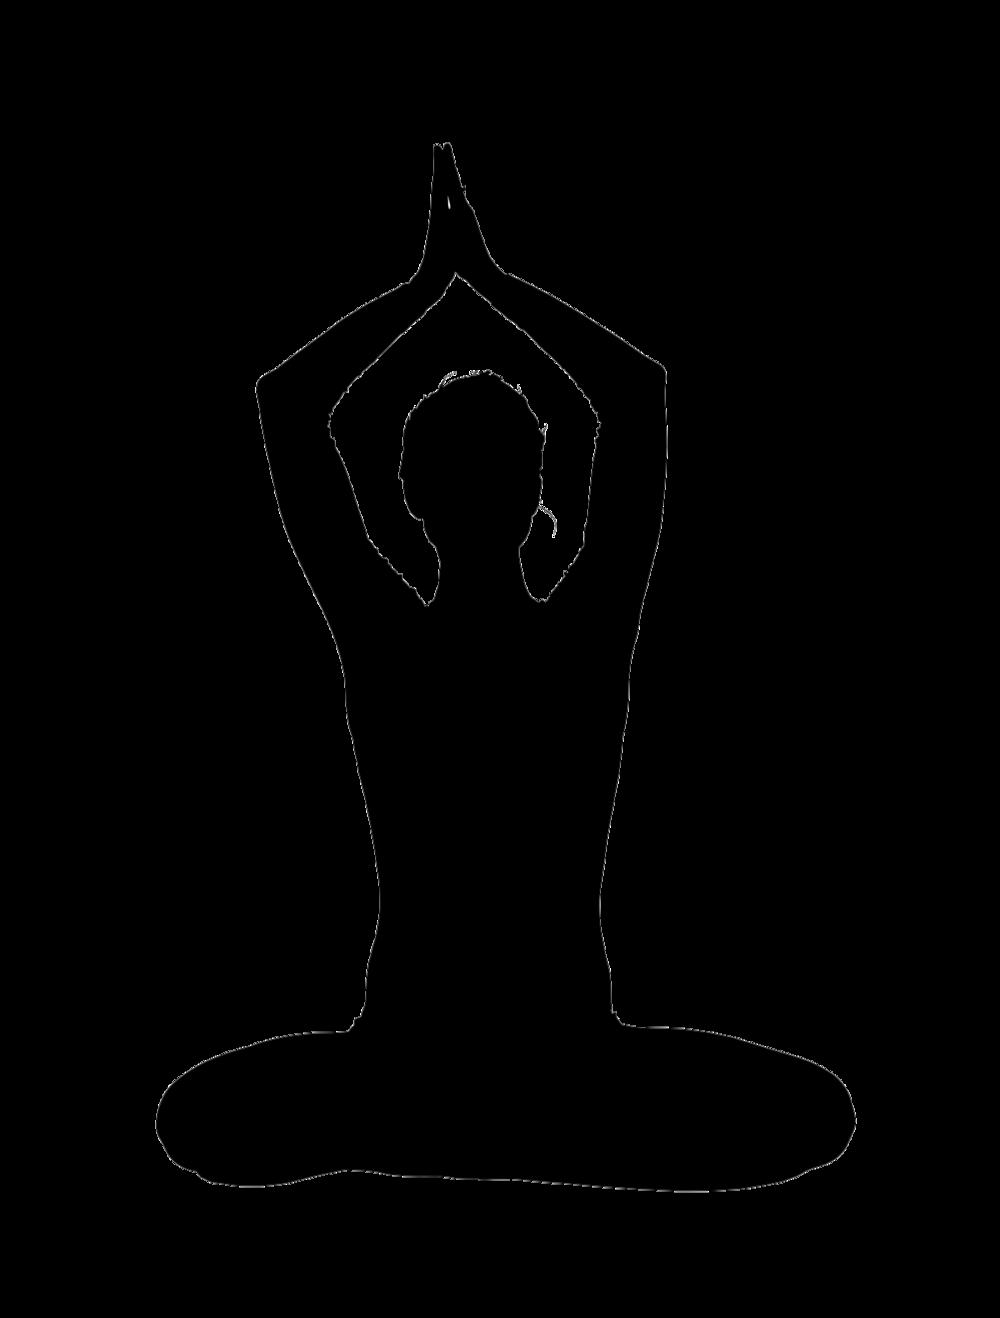 66c39eb9112704a63346160cf17eb0da_-silhouette-yoga-png-yoga-clipart-png_1207-1591.png